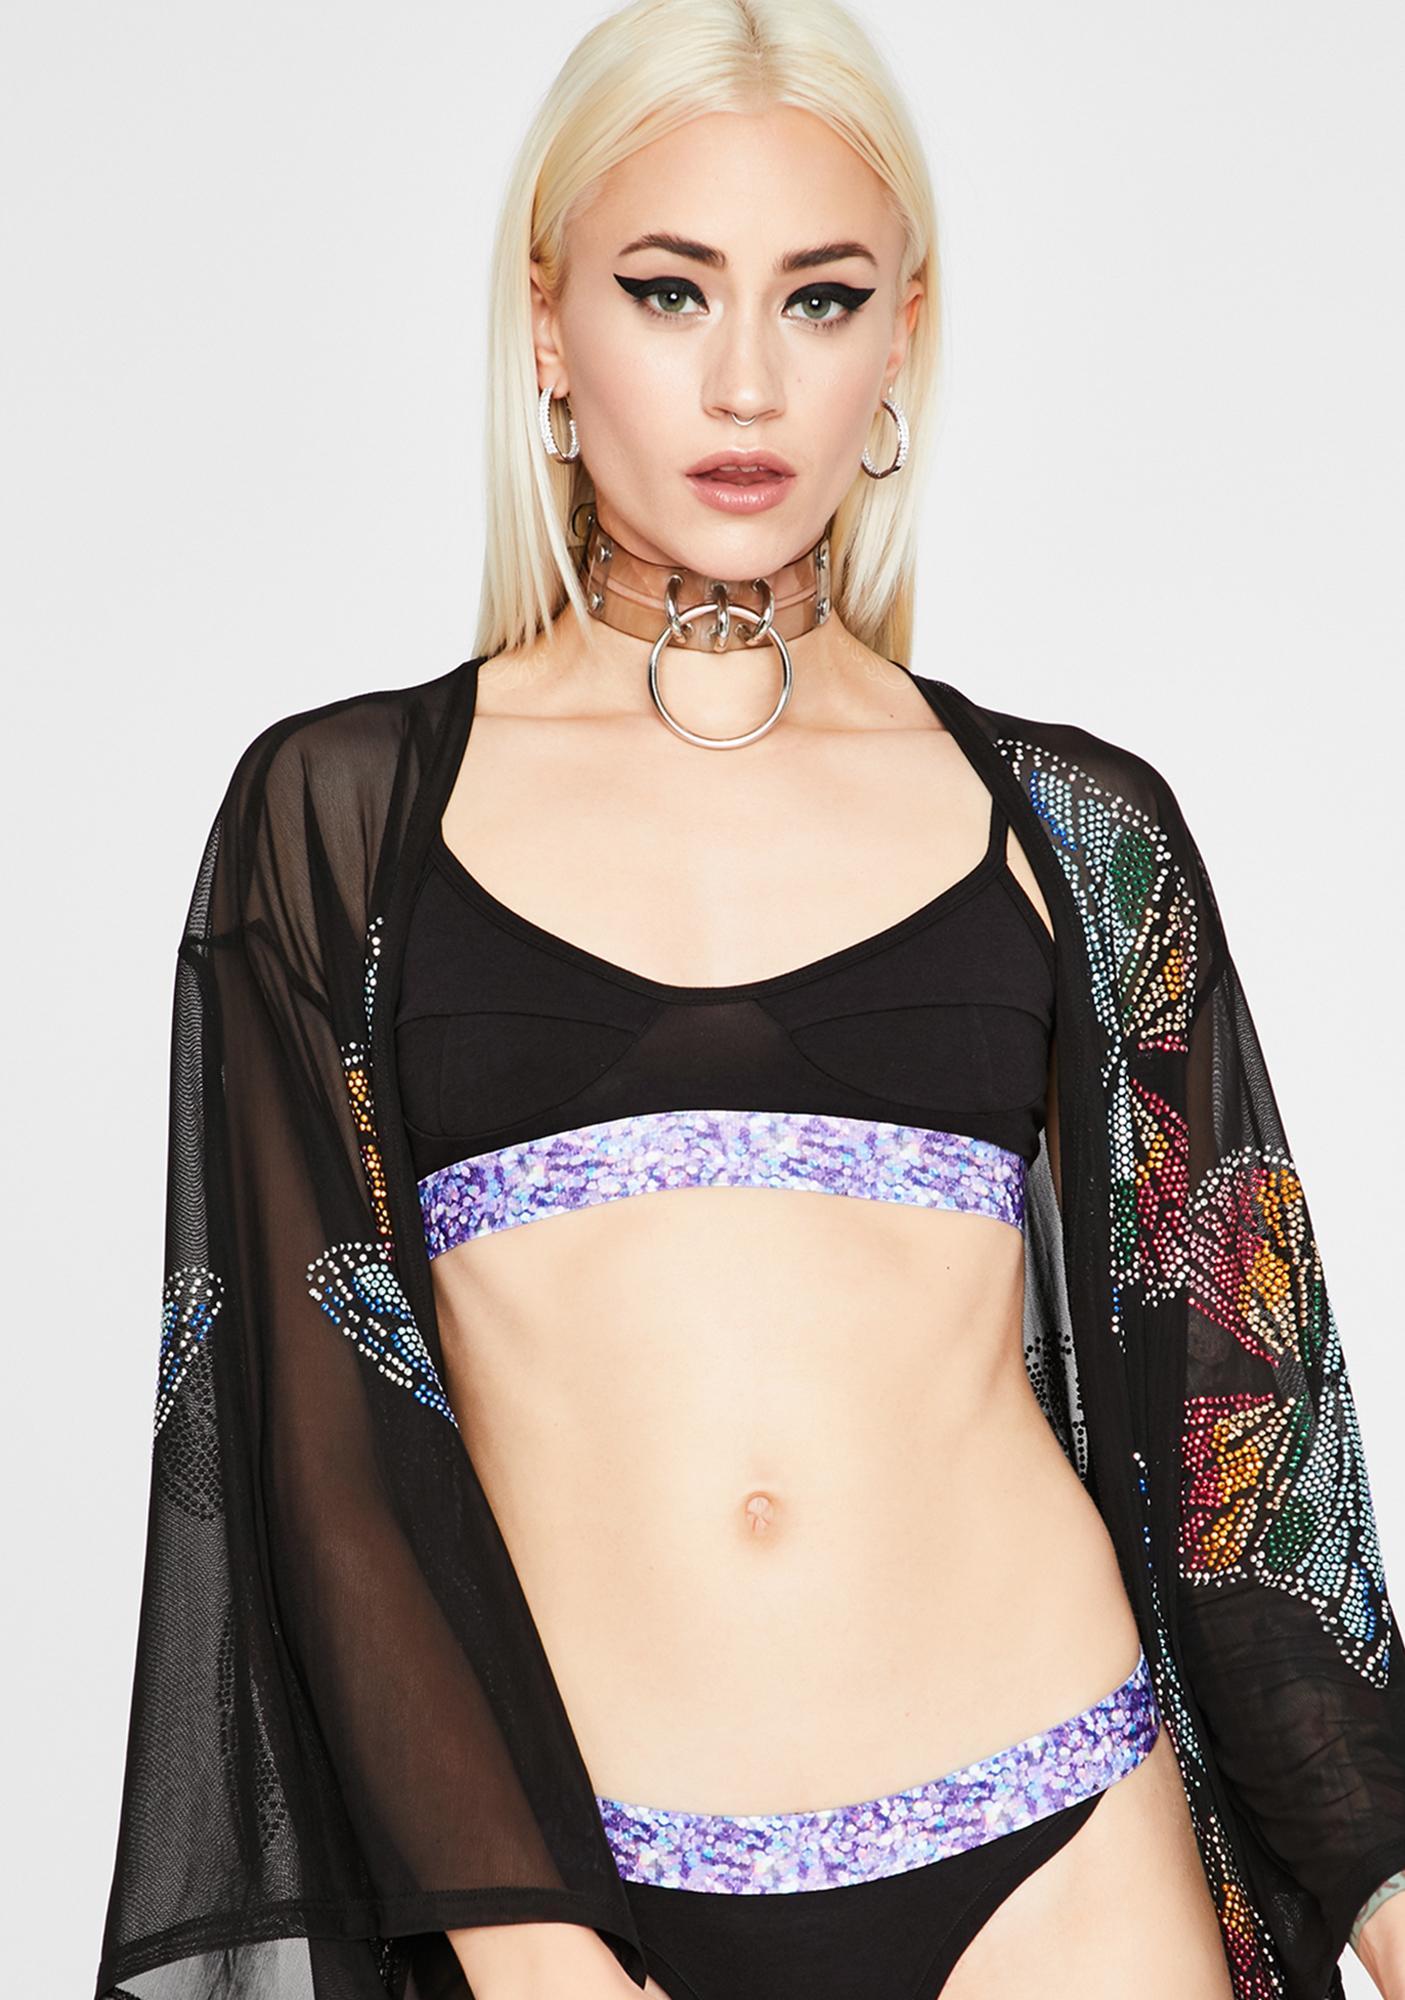 Related Garments Glistening Bralette